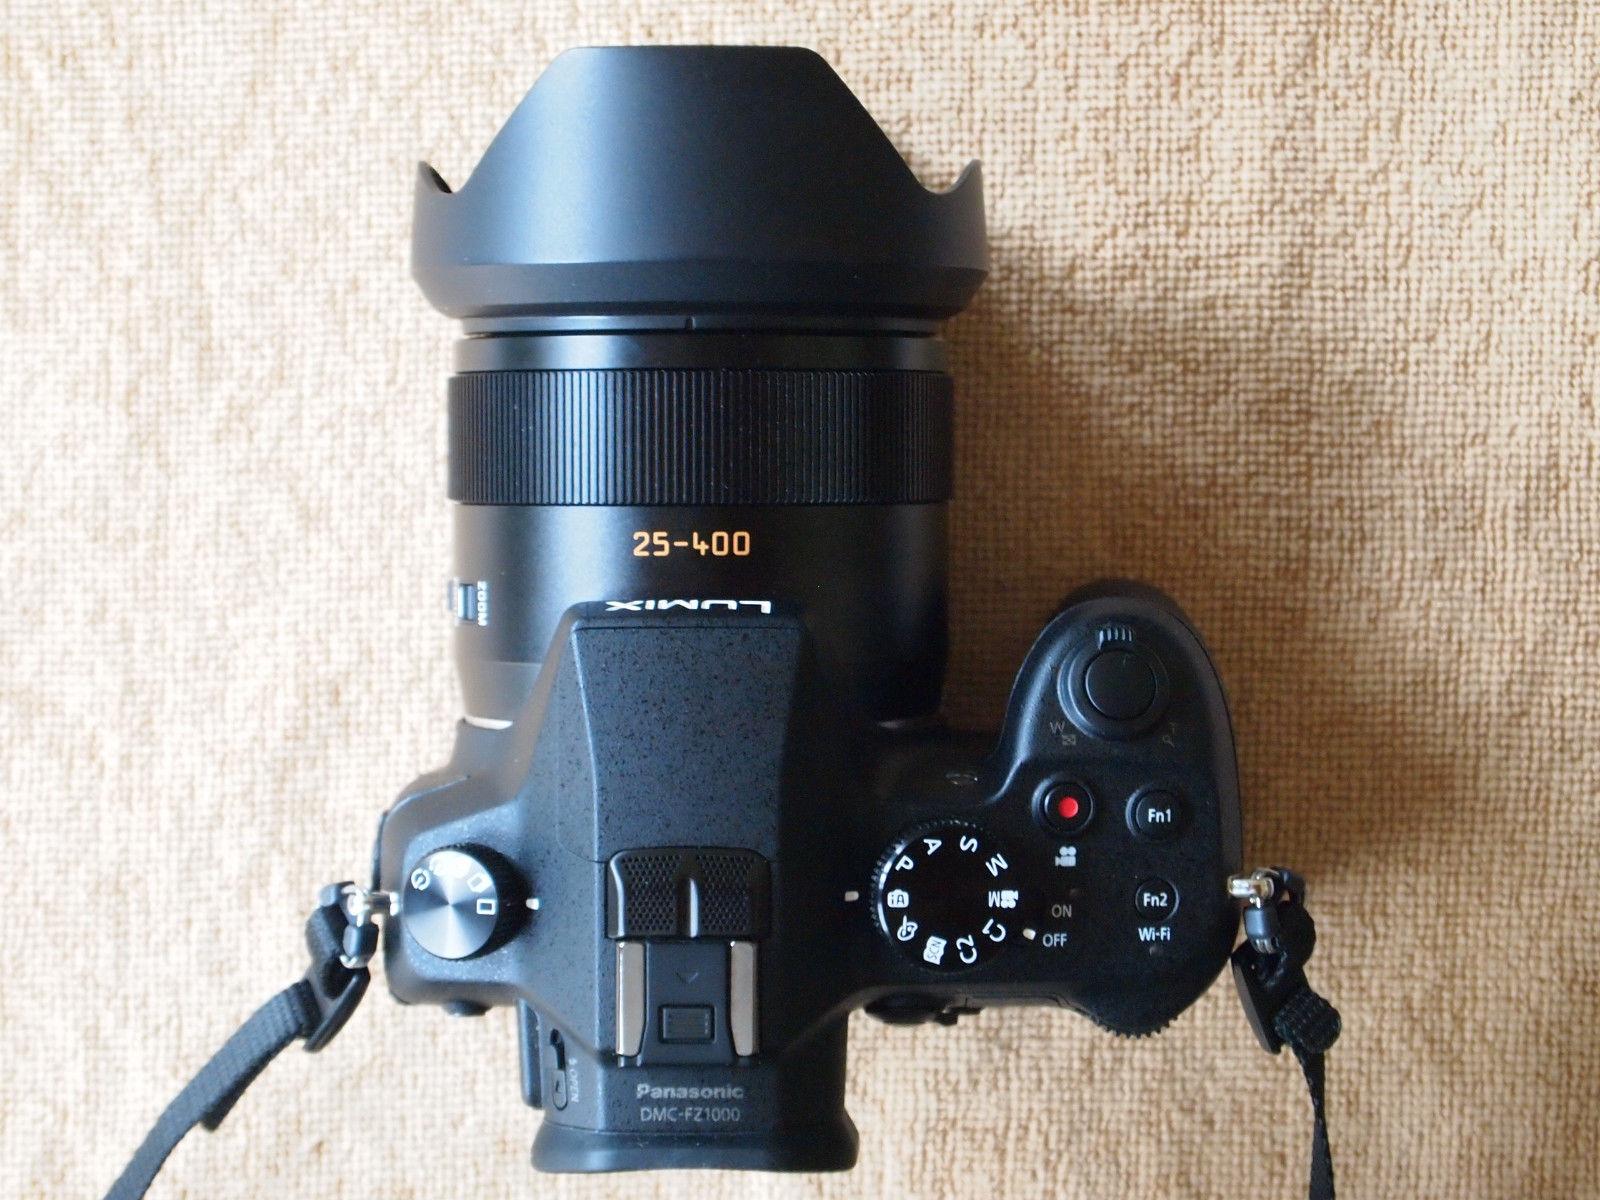 Panasonic LUMIX DMC-FZ1000 20.1 MP Digitalkamera - Schwarz, Leica 25-400 Zoom